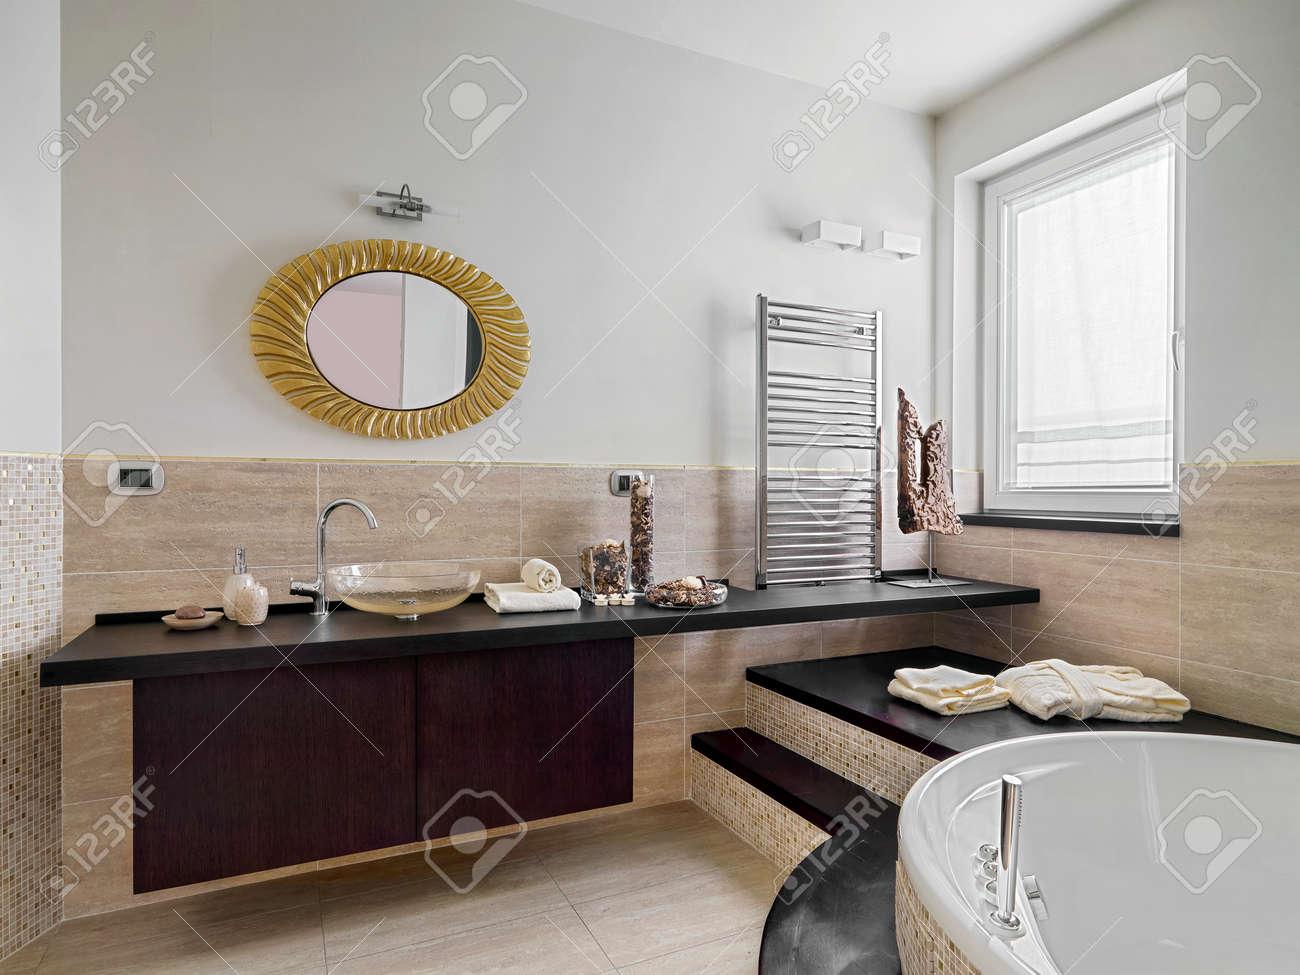 Vasca Da Bagno Ladybird Prezzo : Vasca da bagno prezzi bassi trendy arredobagno miscelatori